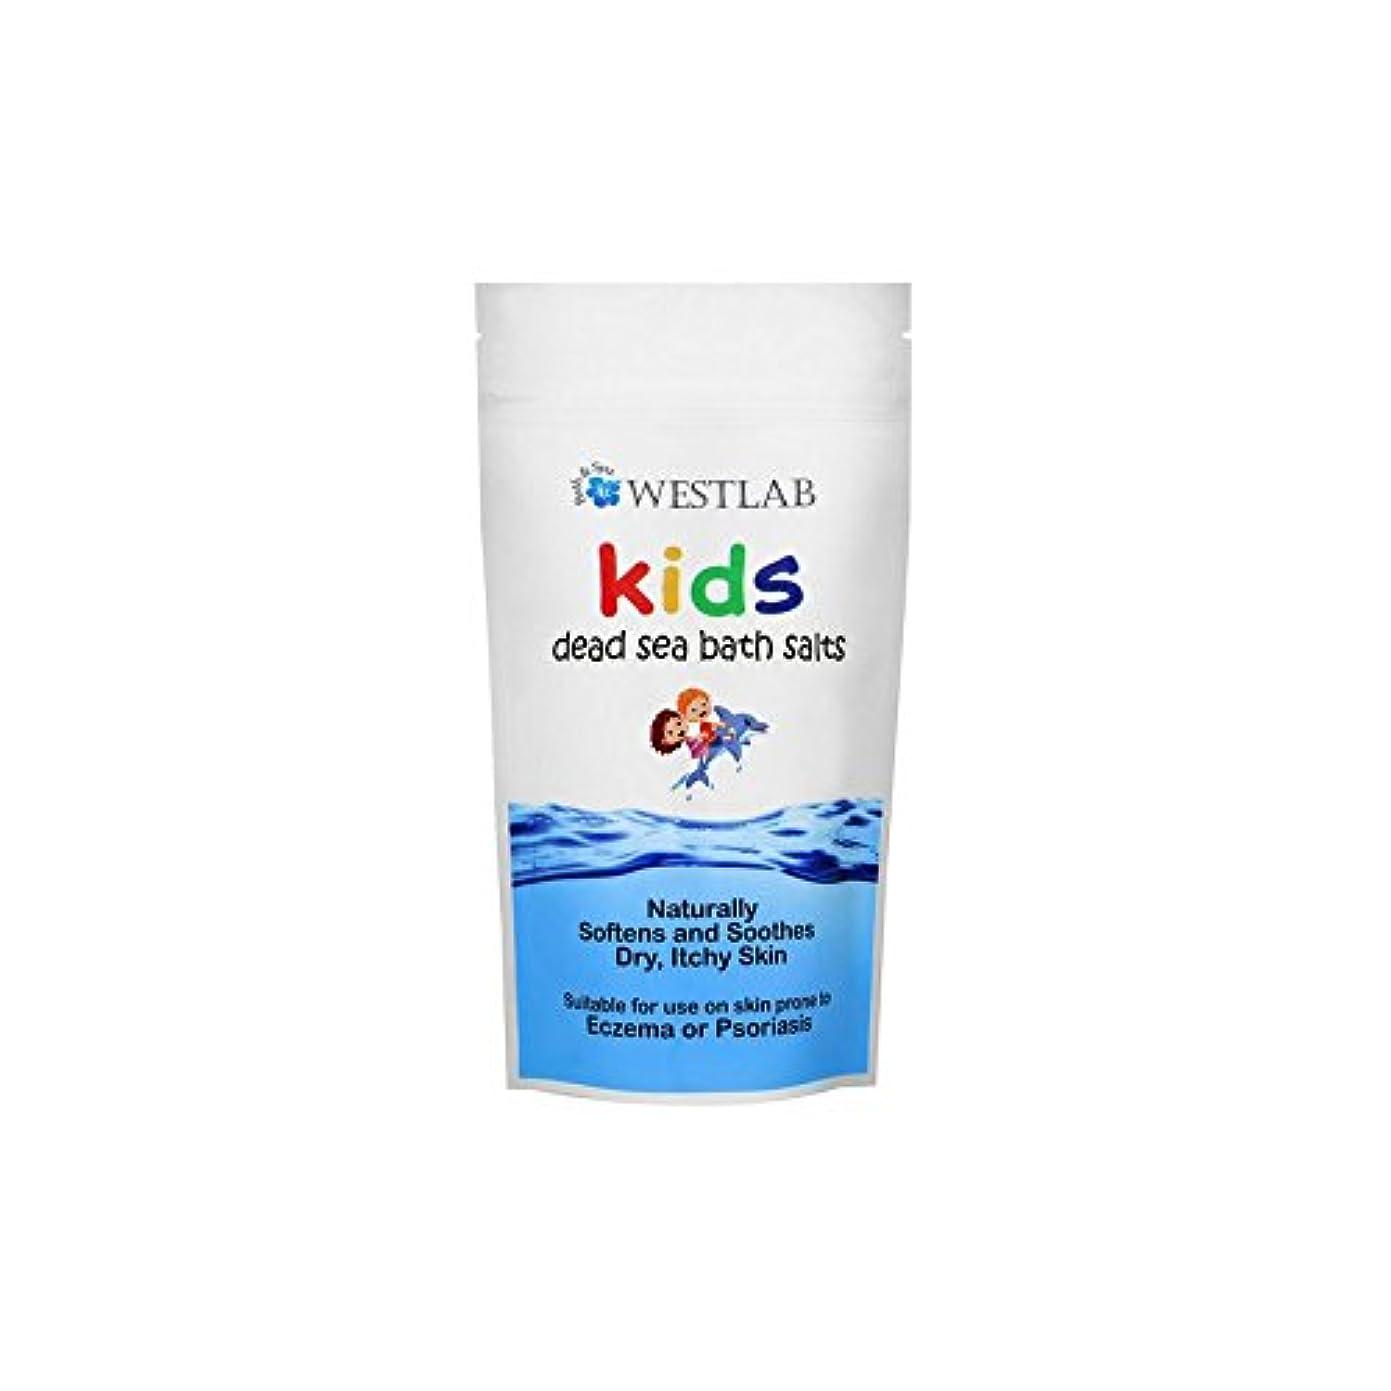 以来飢差別的Westlab Kids Dead Sea Salt (Pack of 6) - 子供死海の塩 x6 [並行輸入品]